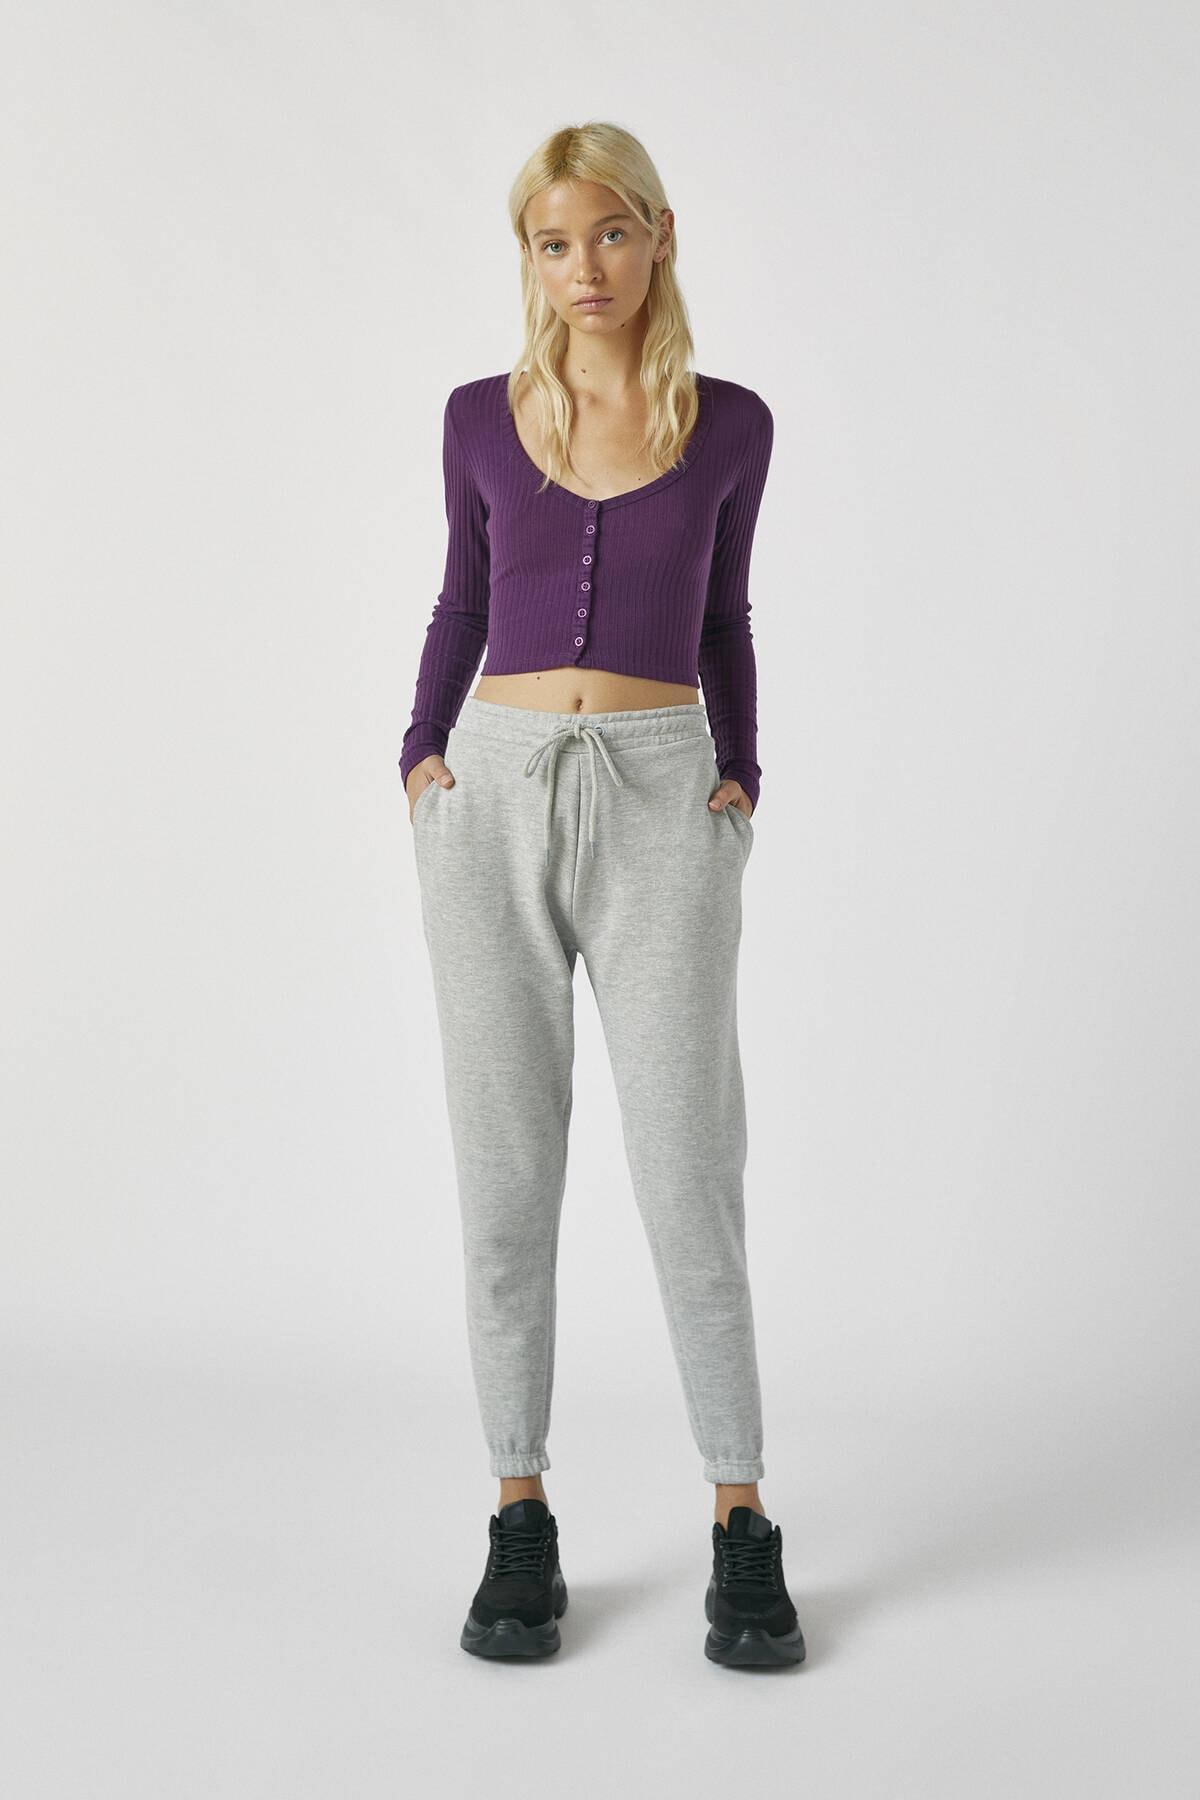 Pull & Bear Kadın Melanj Gri Elastik Paçalı Basic Jogging Fit Pantolon 05670324 1